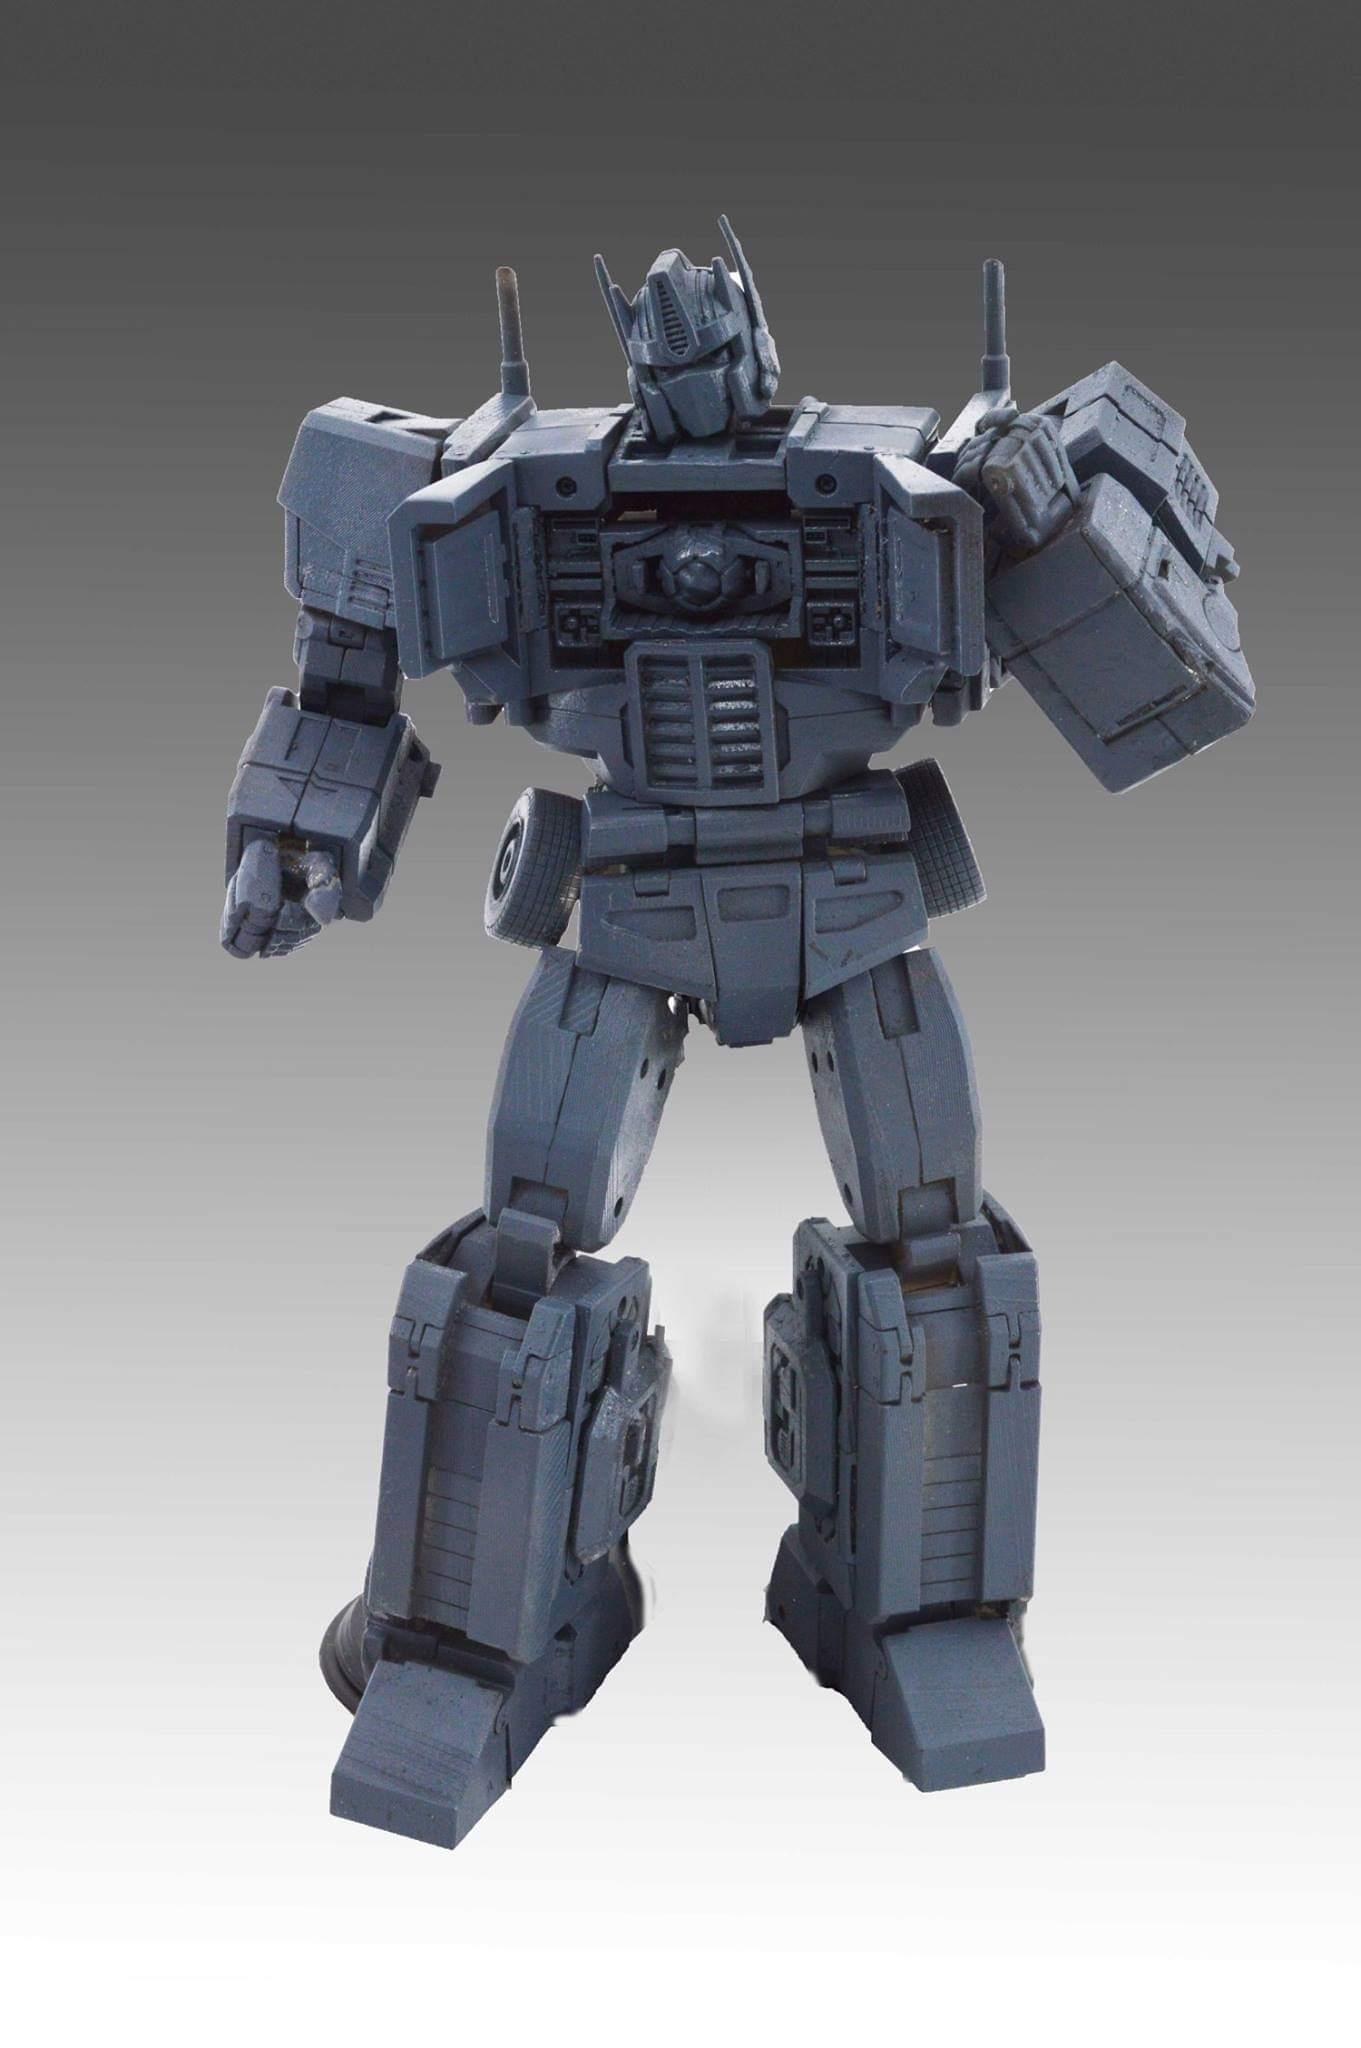 [KFC Toys] Produit Tiers - PC-14 Raijin + PC-15 Grand Raijin + P-16 Raiju - aka Ginrai (Powermaster Optimus) + Remorque de Ginrai + Godbomber = God Ginrai (TF Masterforce) NSjDrKaa_o